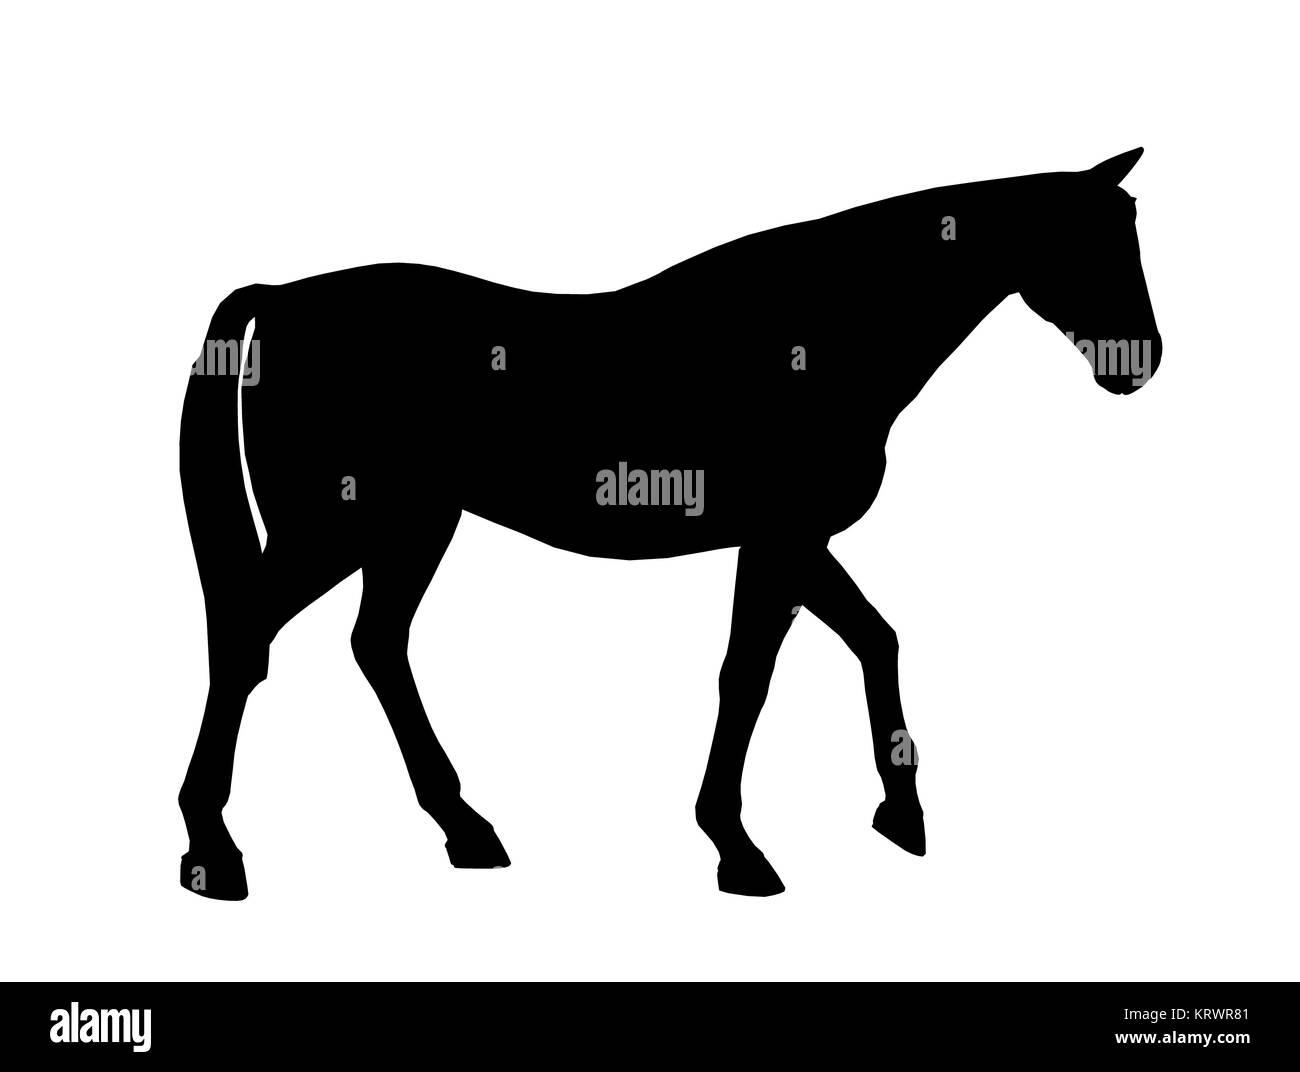 Black horse art illustration silhouette on a white background - Stock Image